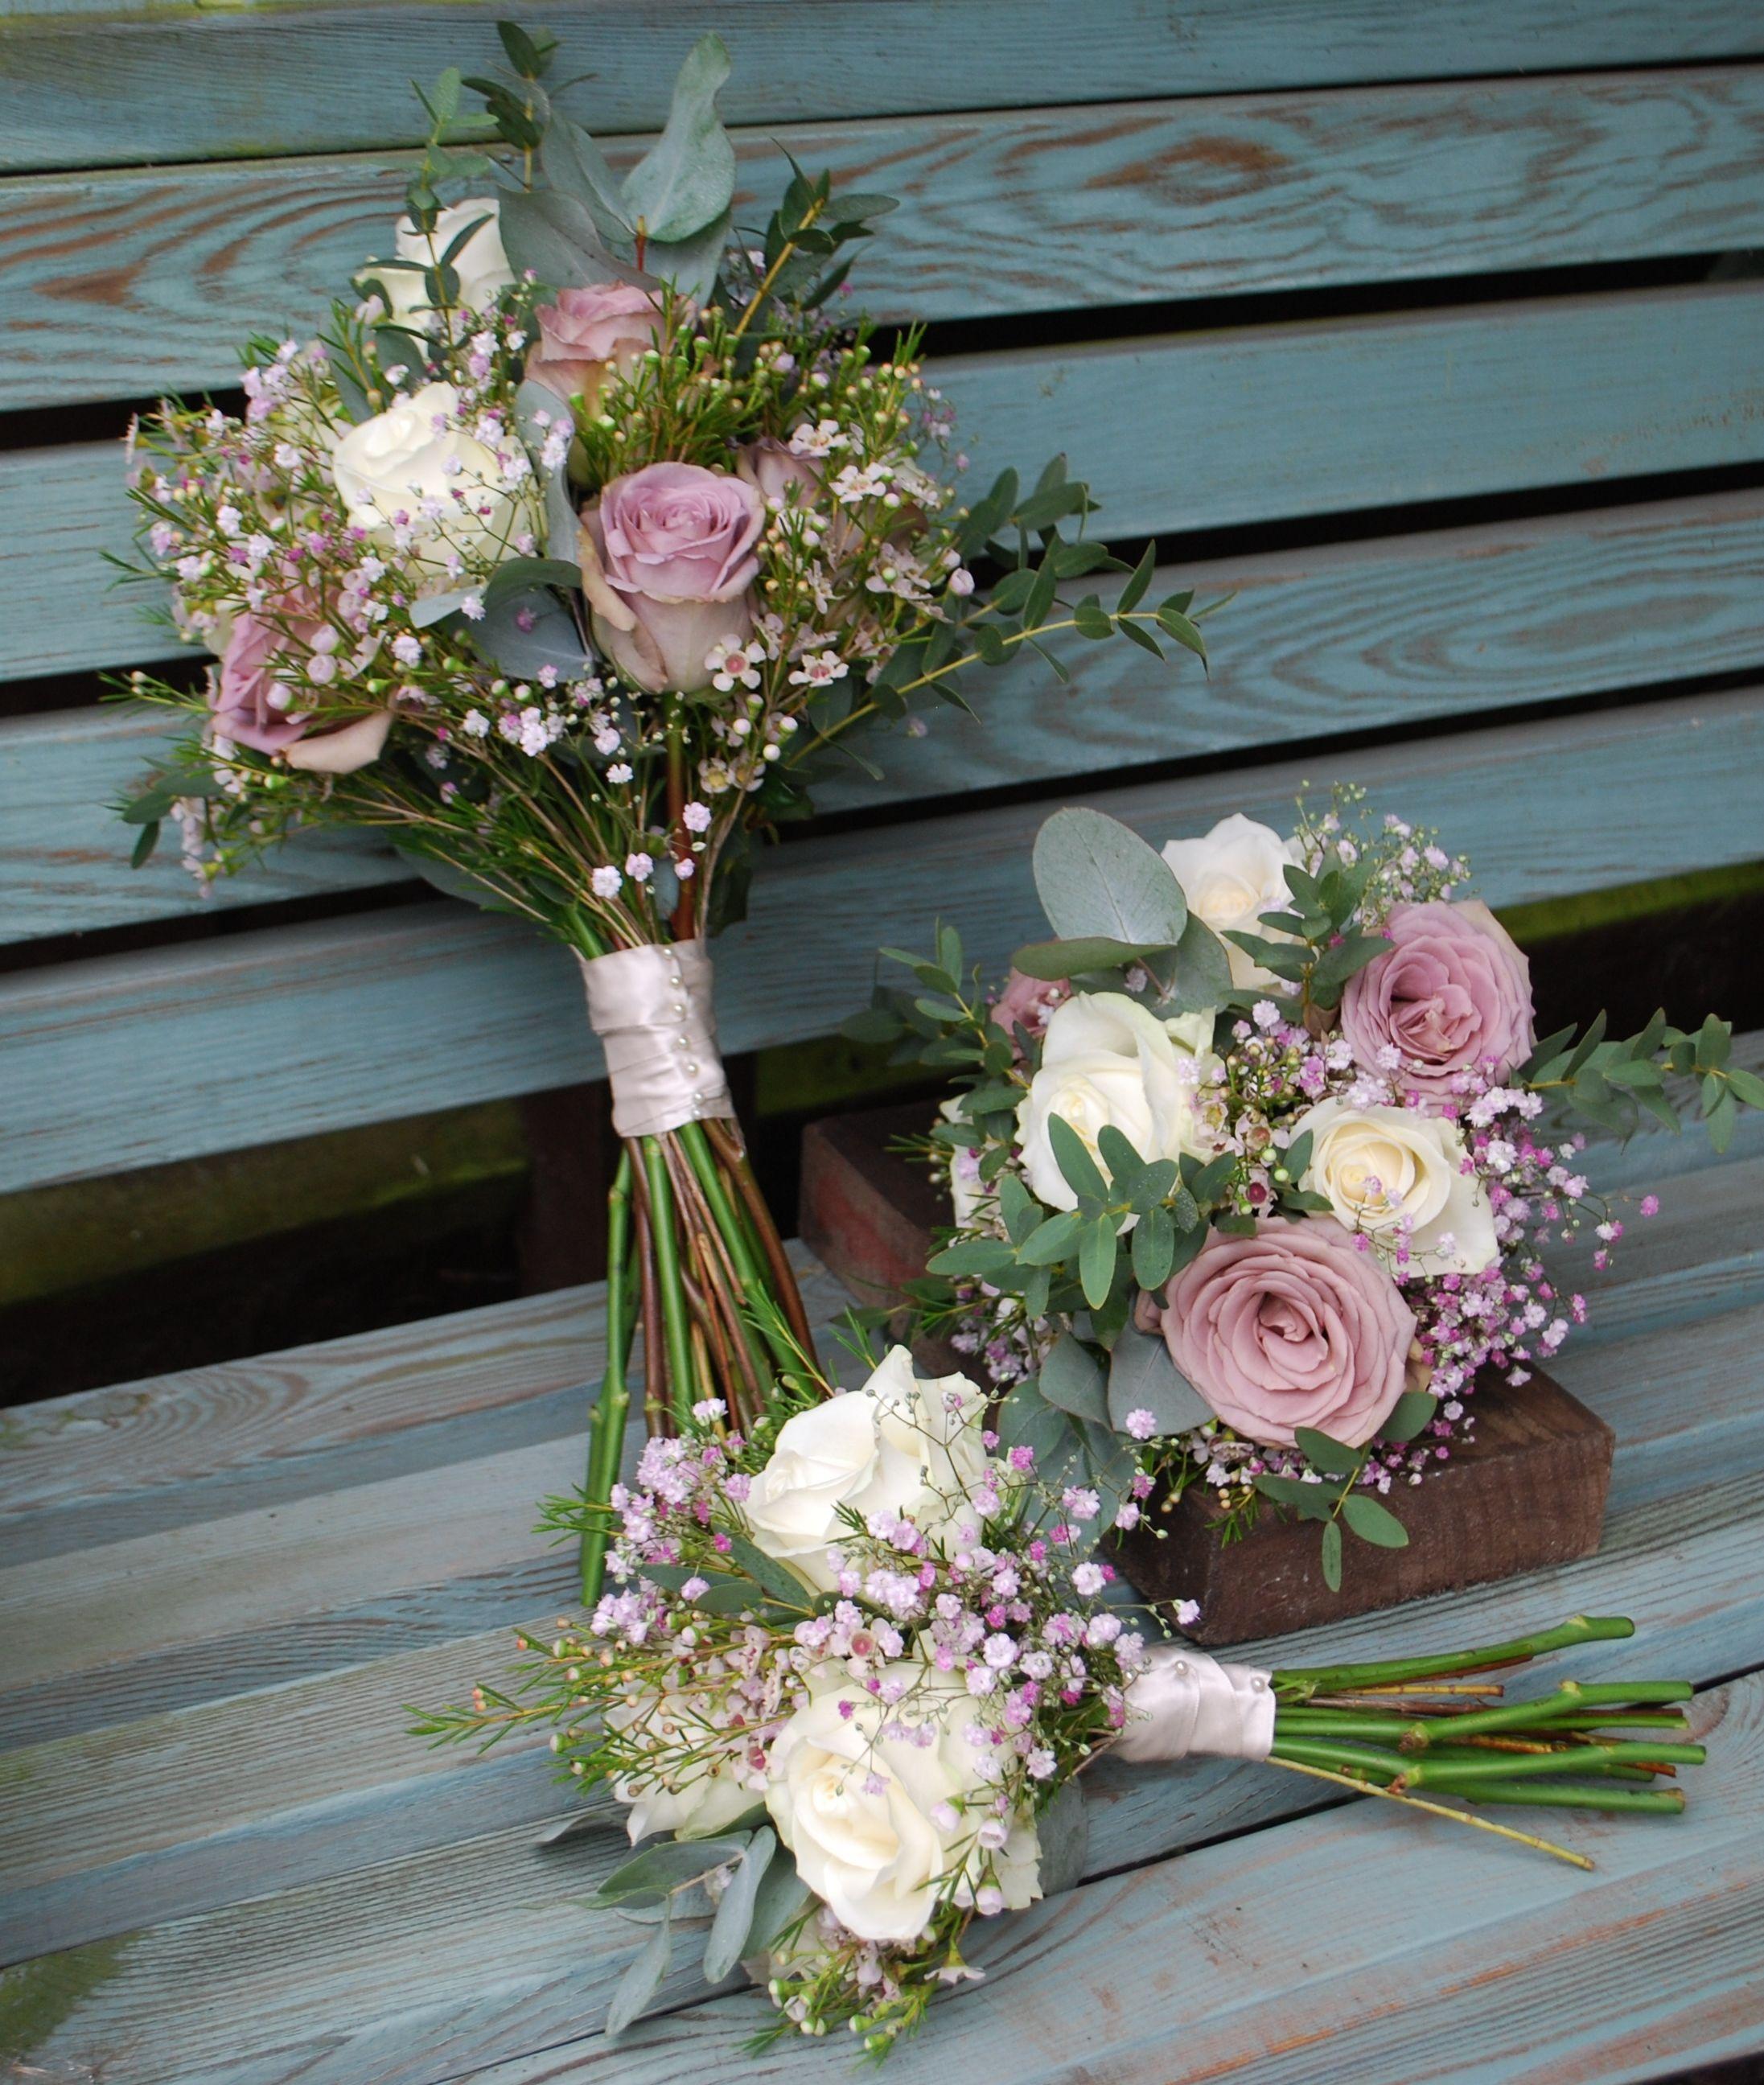 Wedding Flower Arrangements Pinterest: Vintage Rose And Gypsophila Bridal Bouquet (pretty With